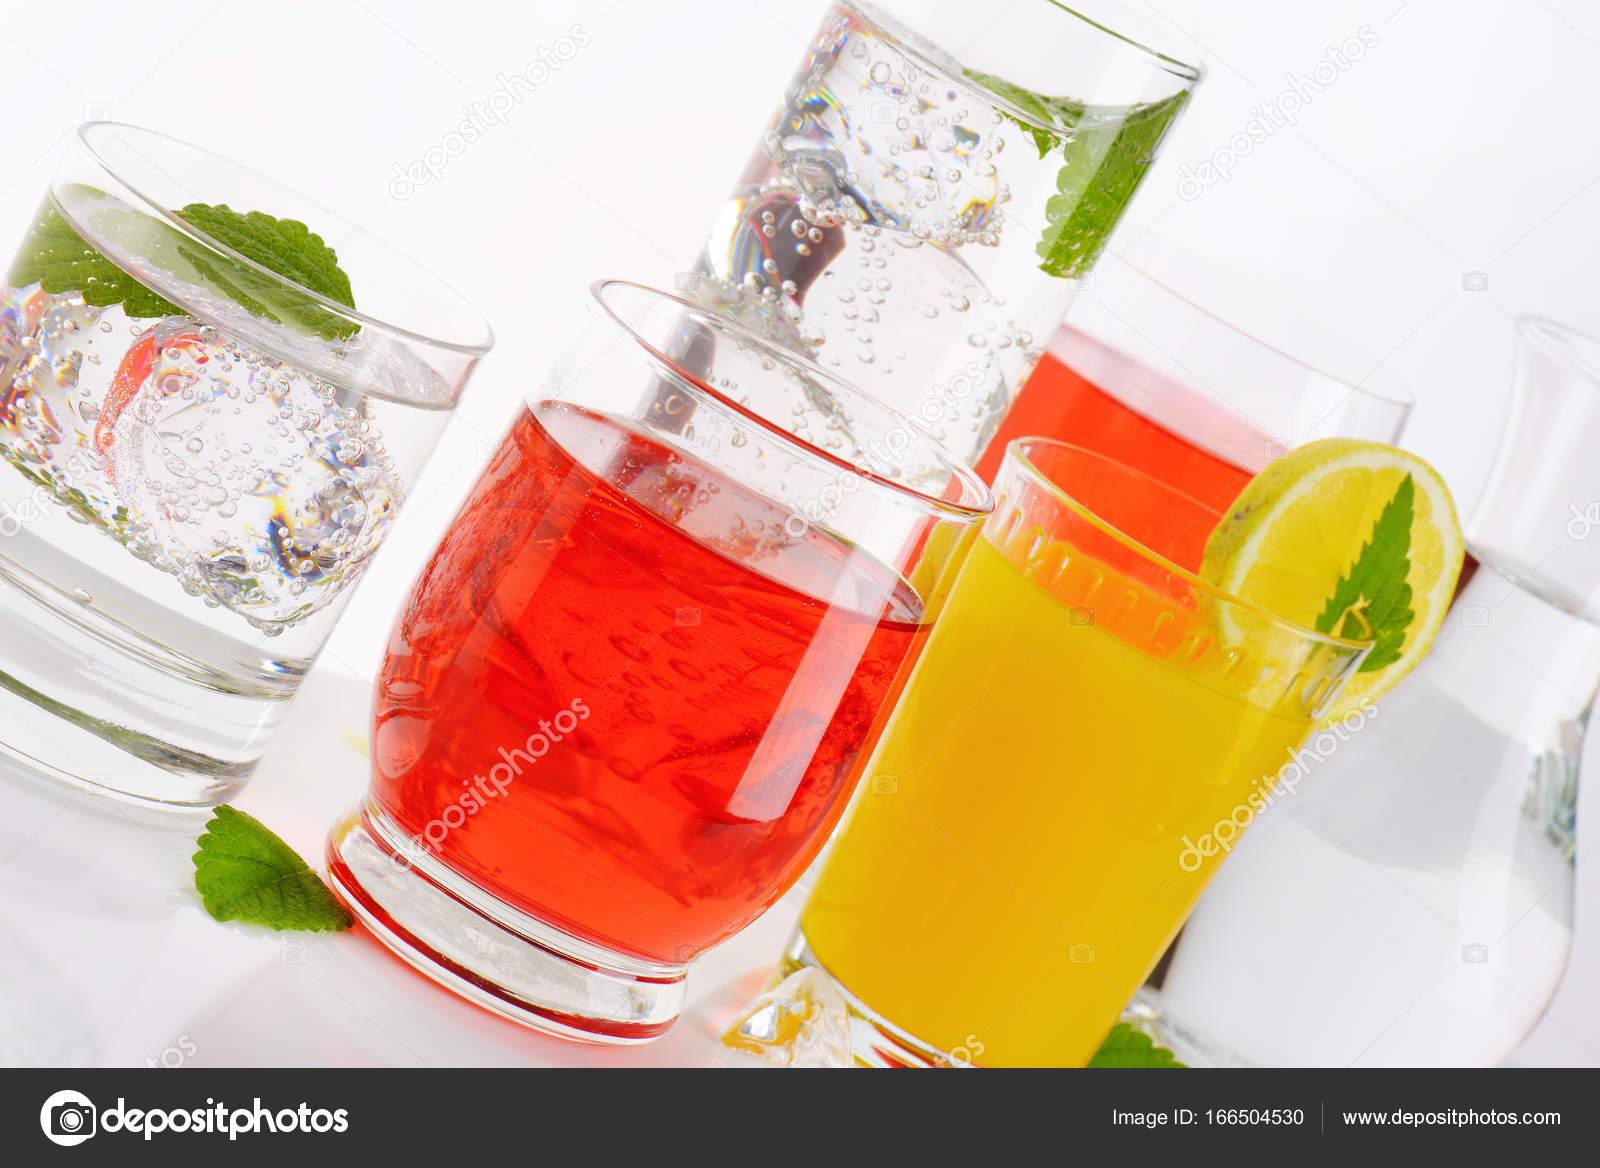 Sommer kalte Getränke — Stockfoto © ajafoto #166504530